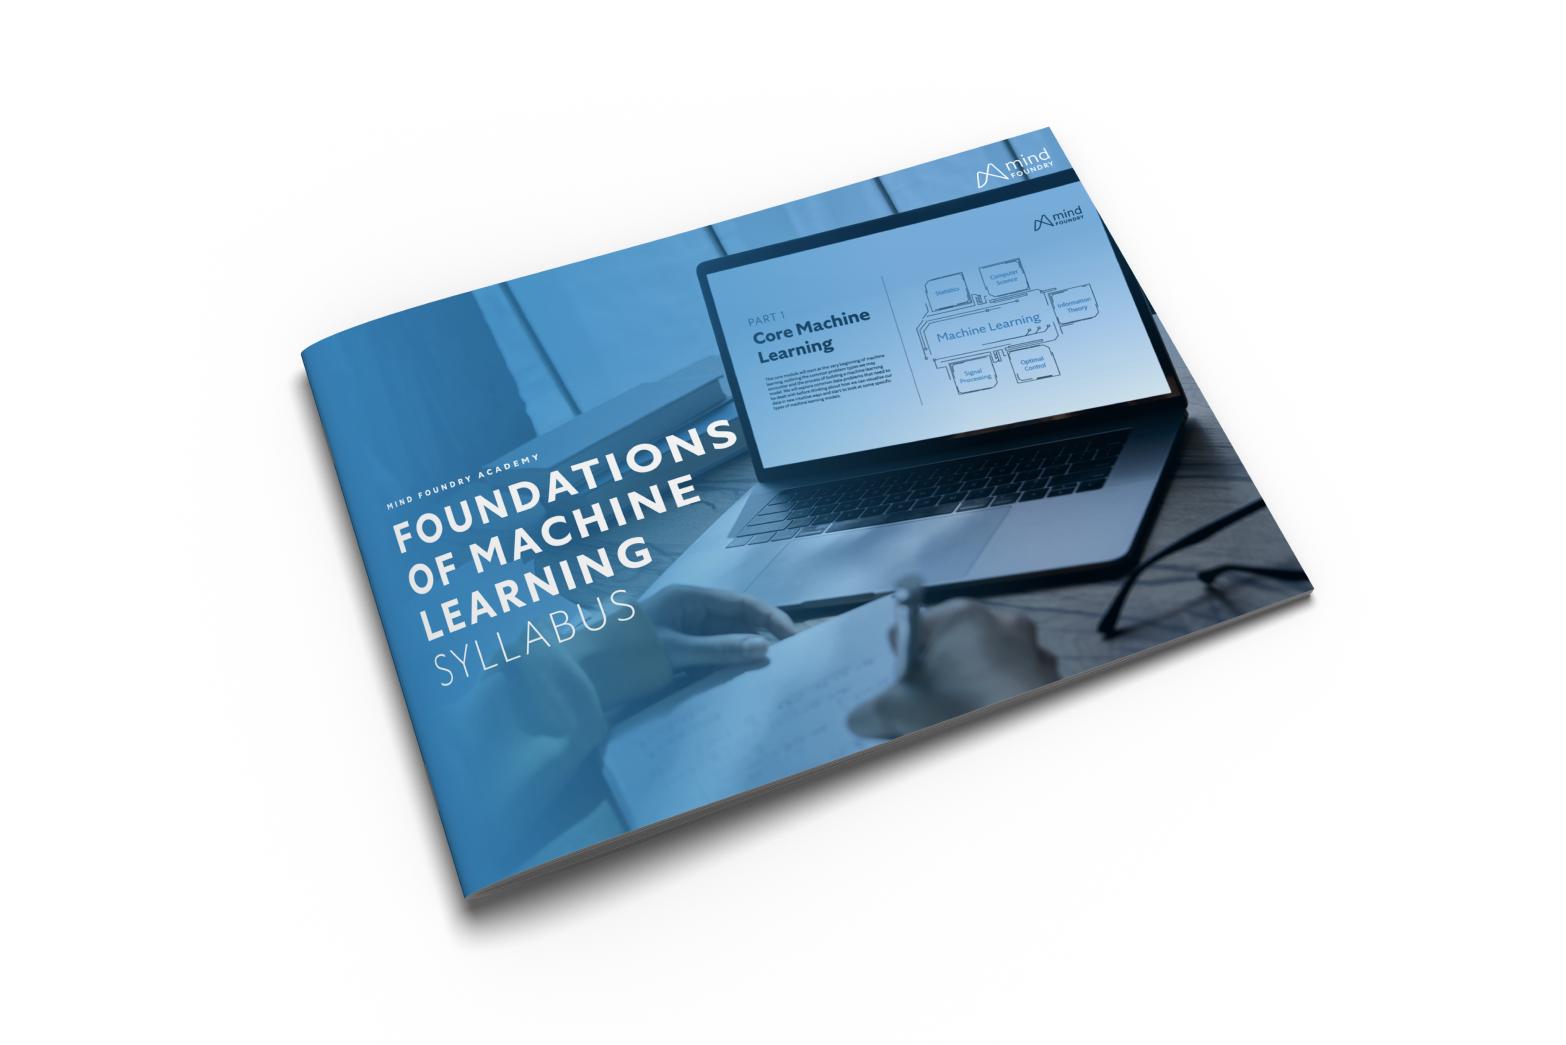 Foundations of Machine Learning Syllabus